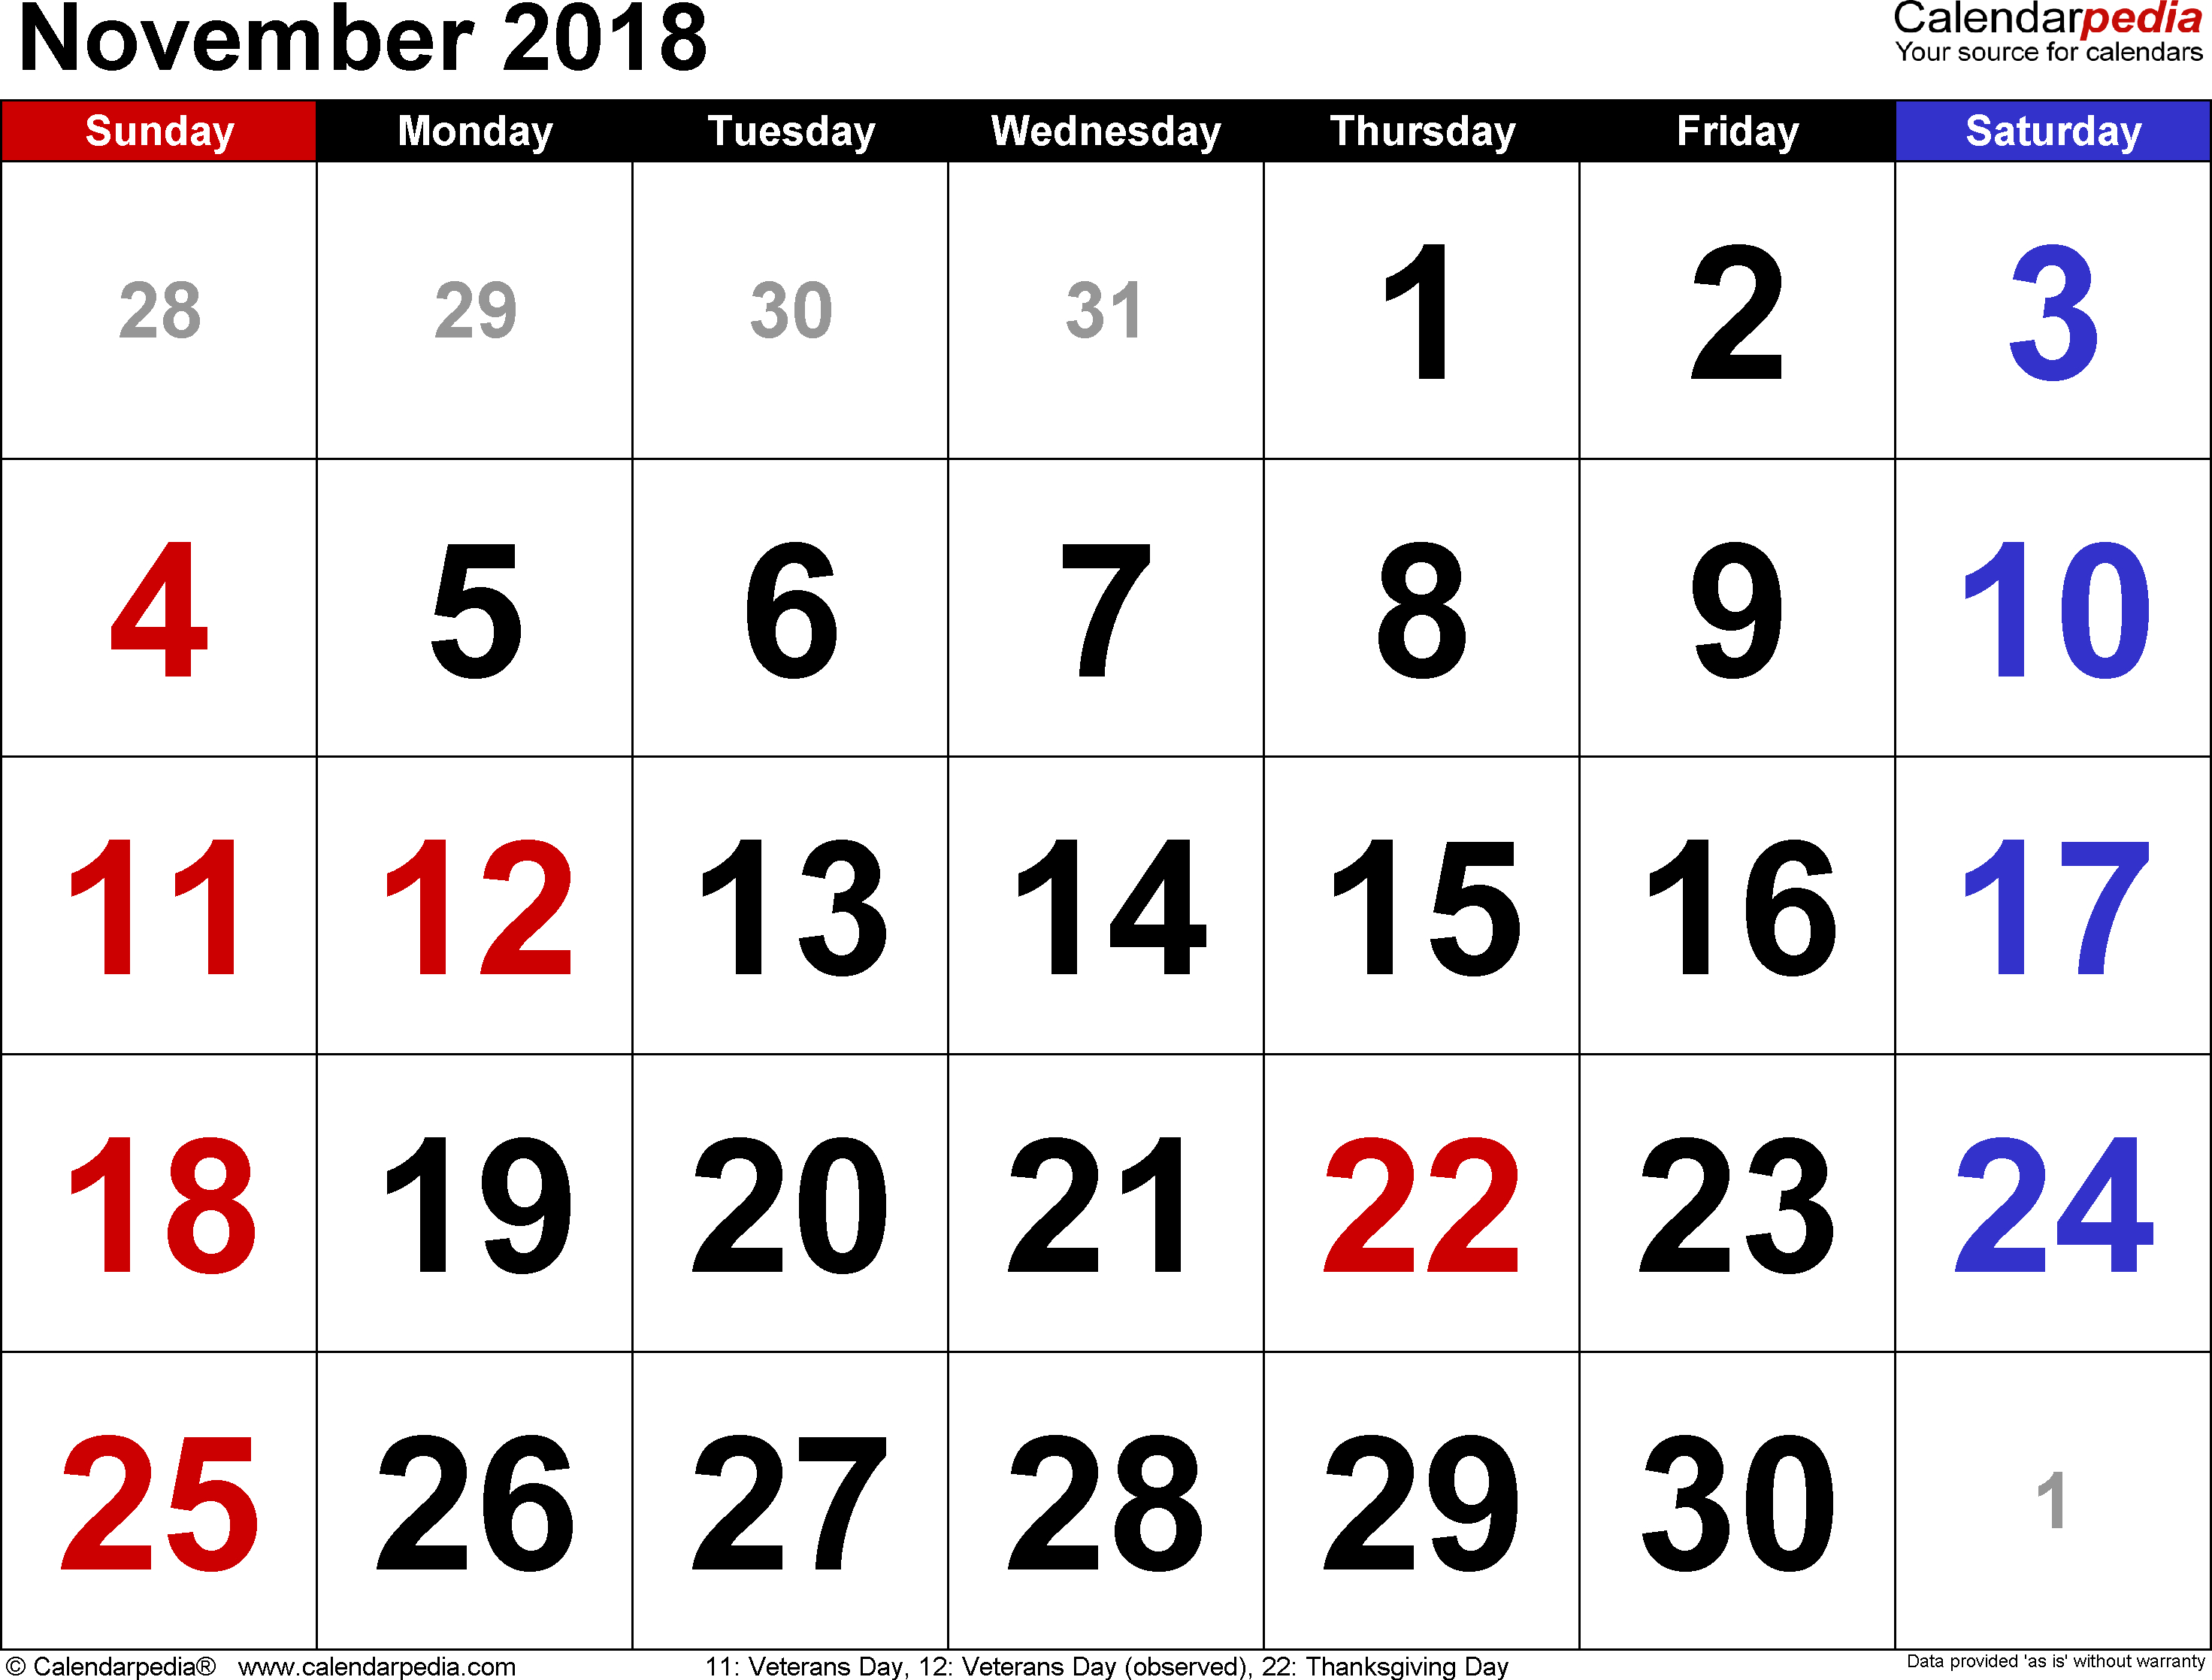 November 2018 Calendars For Word, Excel & Pdf regarding Holidays Calendar Templates November